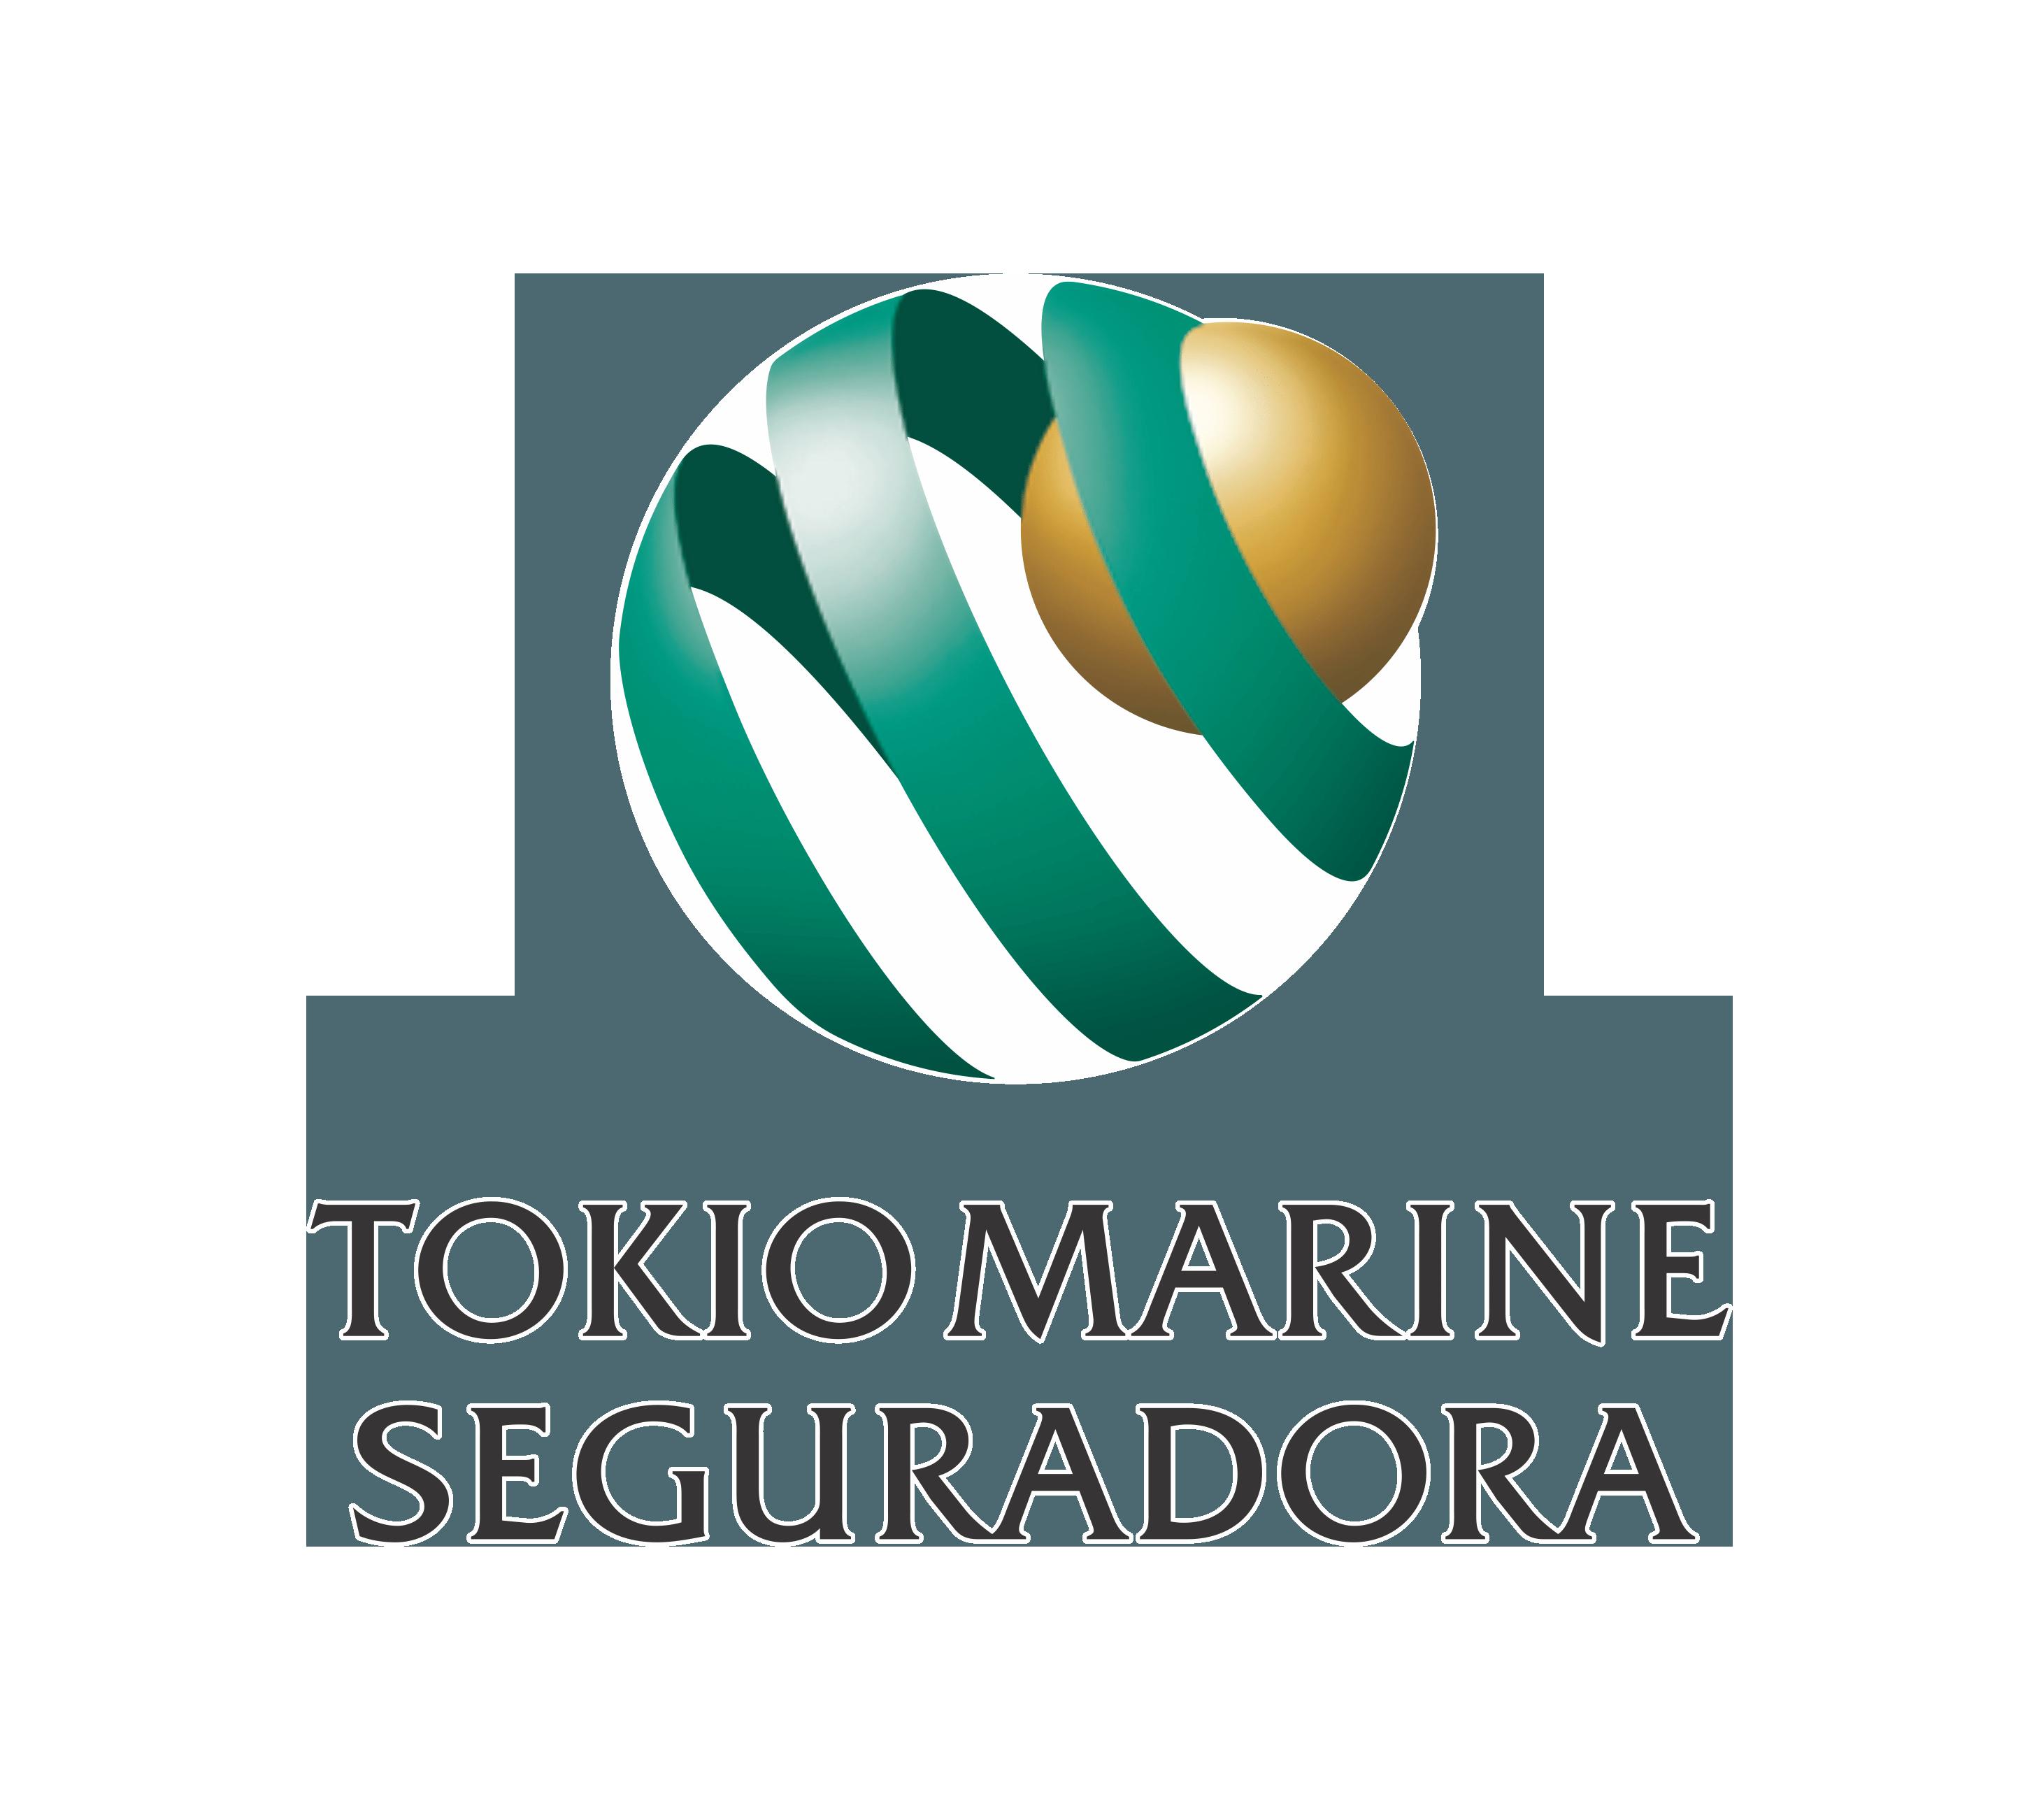 tokiomarine